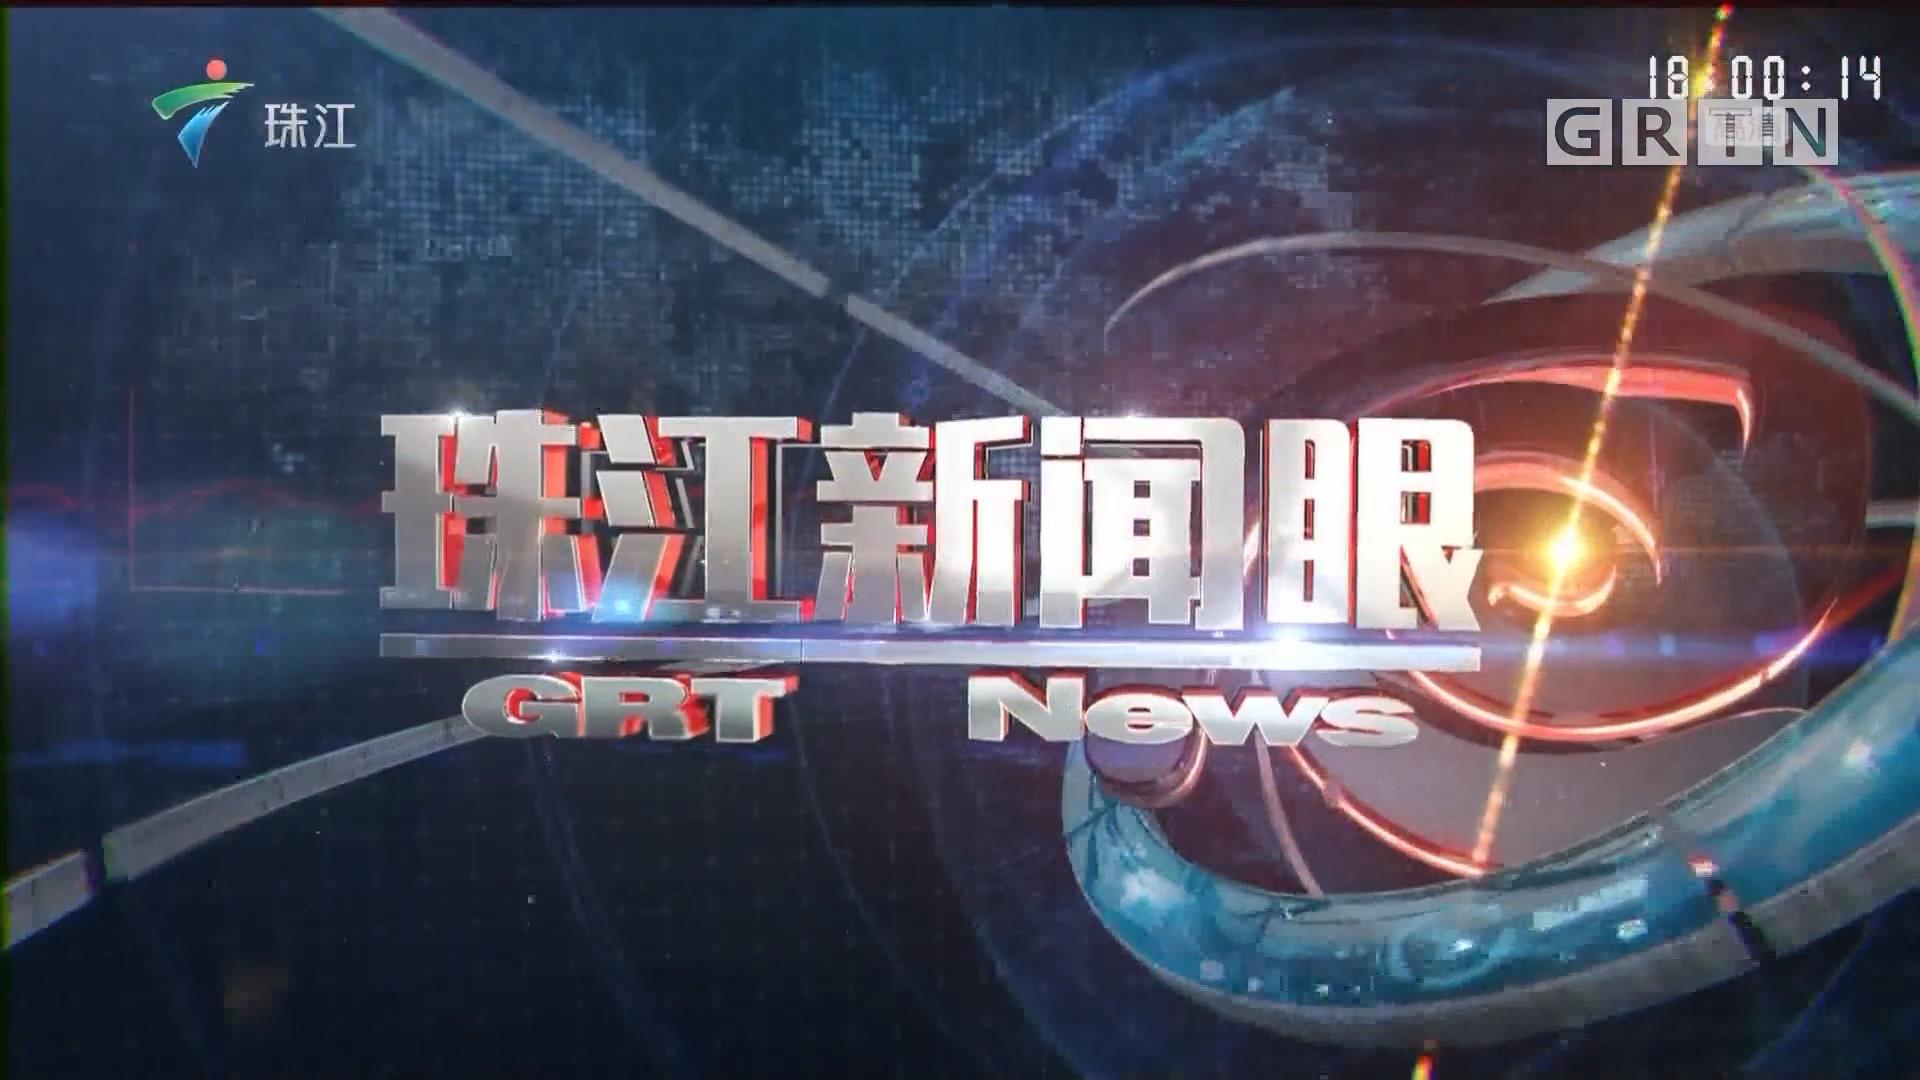 [HD][2018-11-20]珠江新闻眼:虎门二桥主线全面贯通 明年5月通车